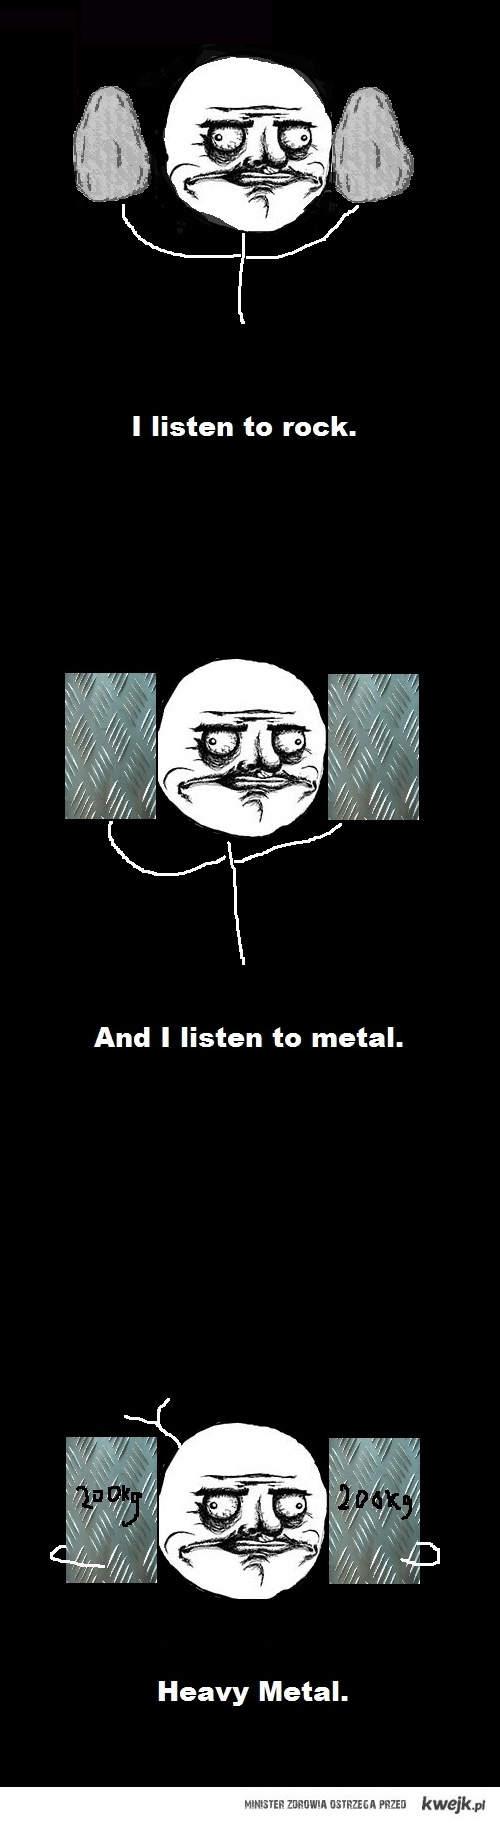 Słucham...